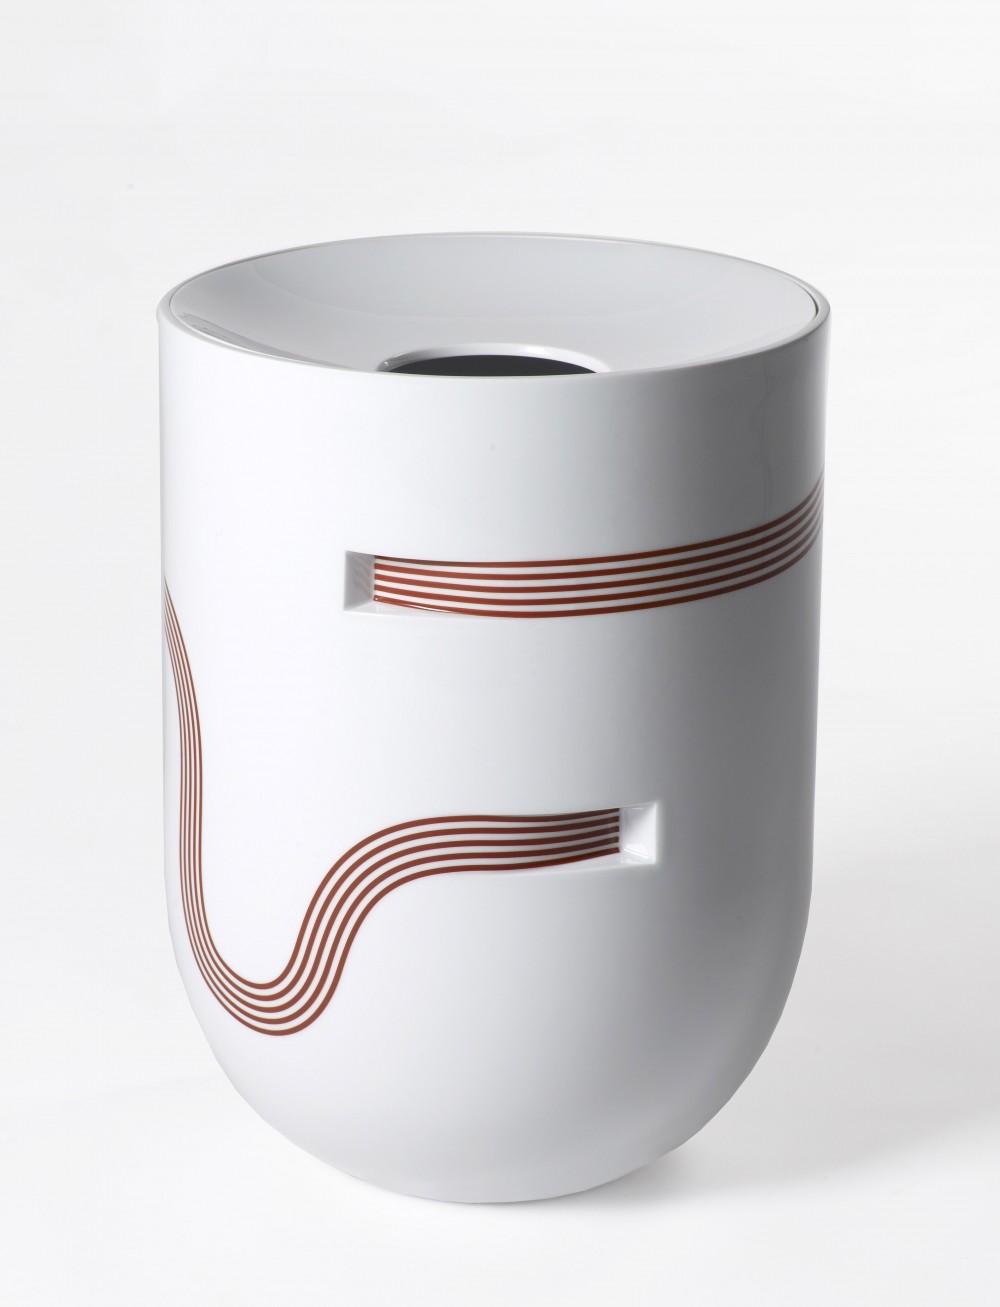 Vase Ruban - © Pierre Charpin